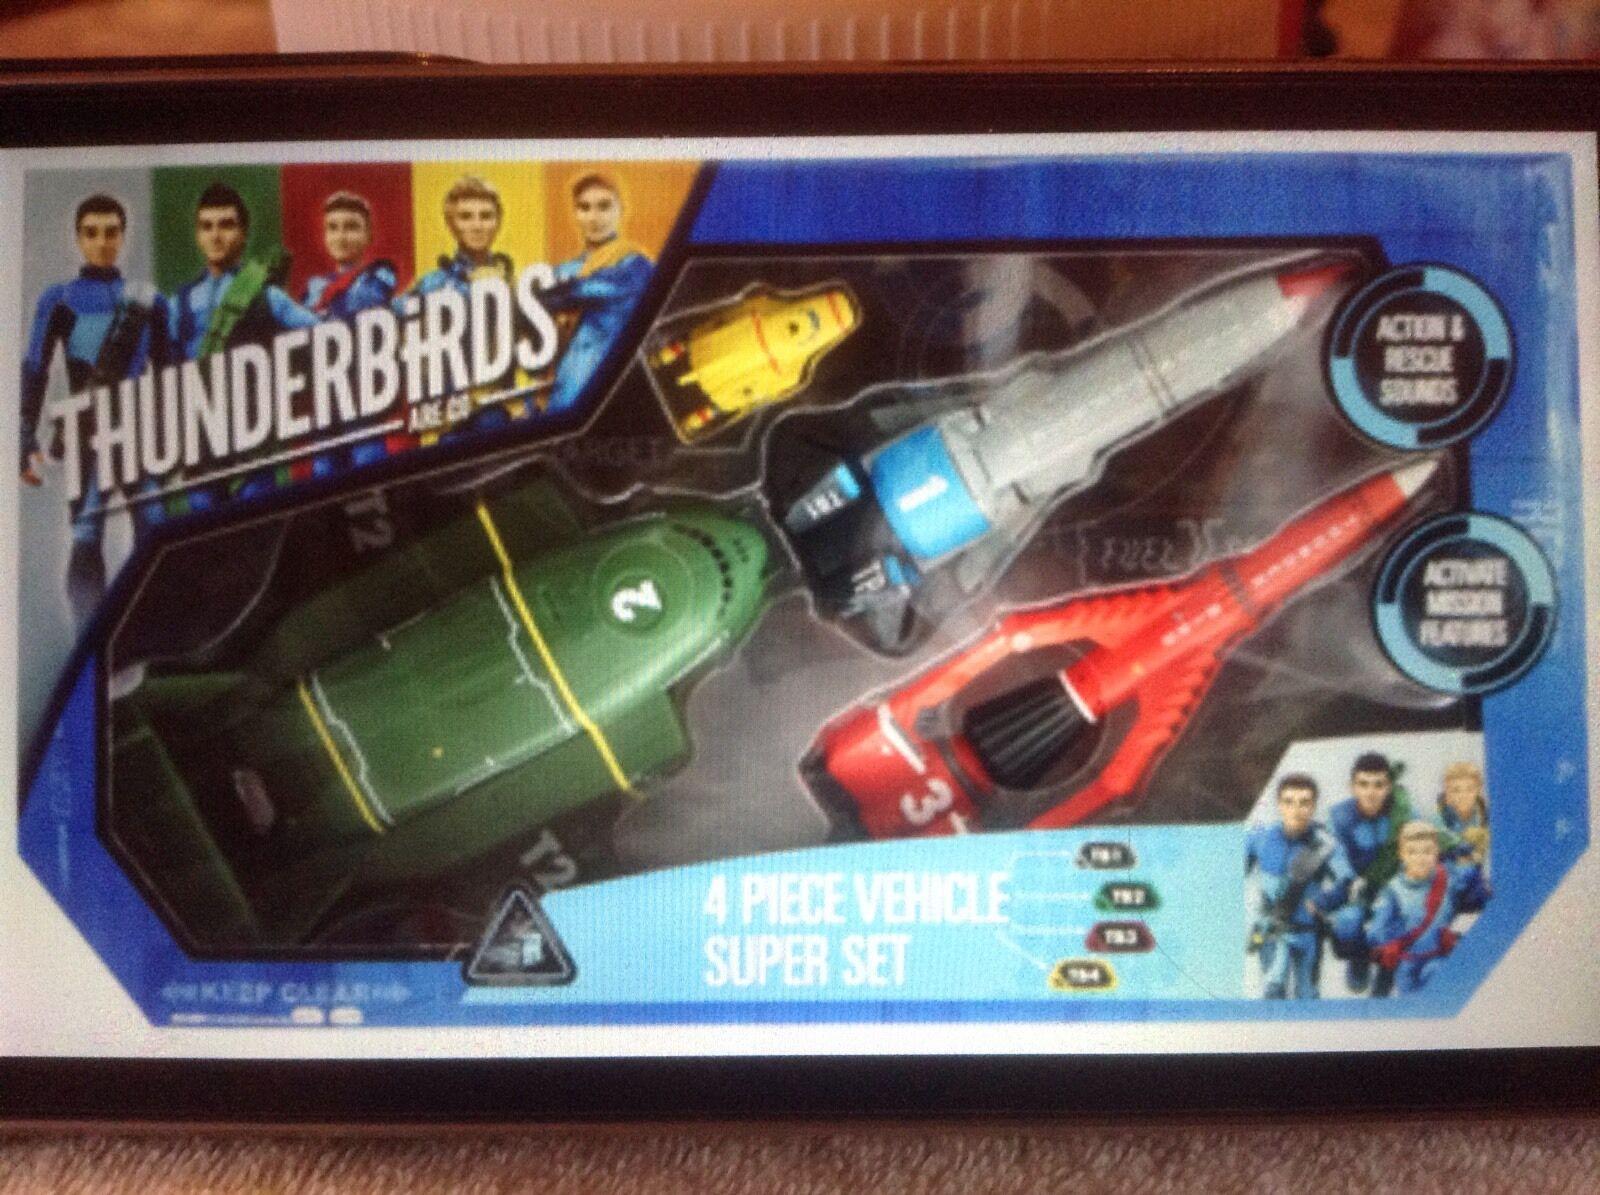 Thunderbirds Are Go - SET de 4 VEHICULES Interactif (Version Anglaise)